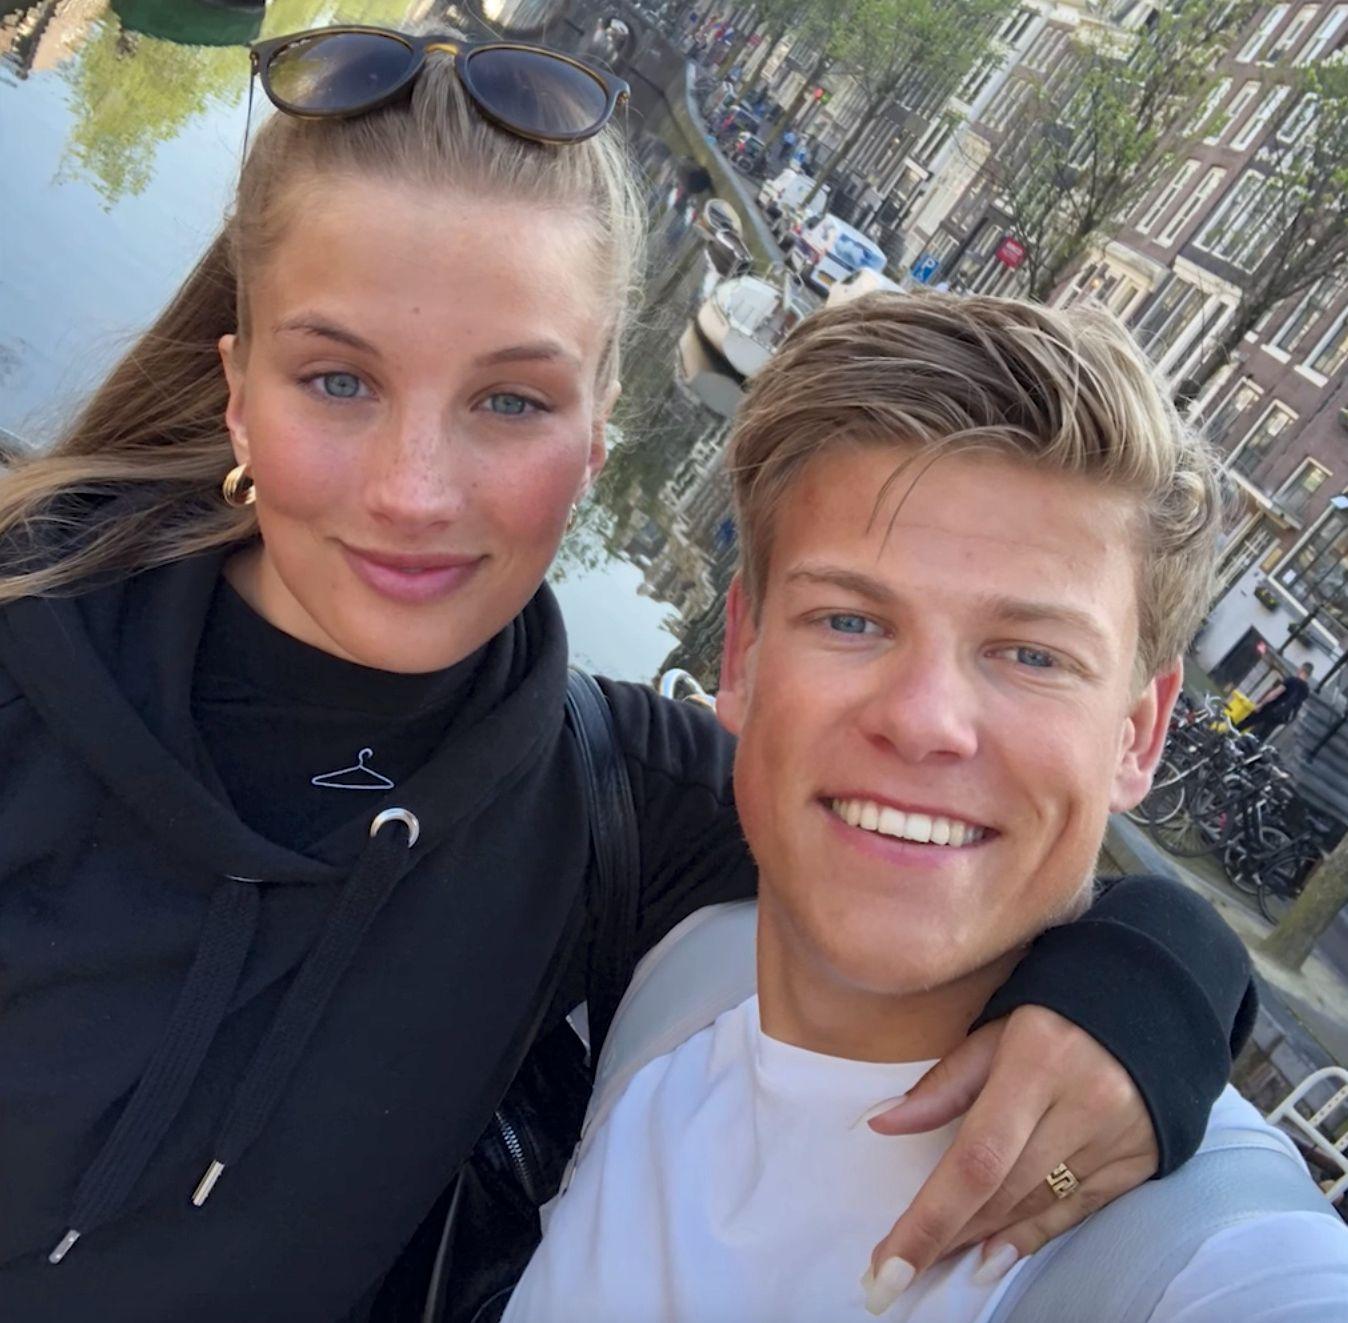 FLYTTER SAMMEN: Pernille Døsvik og Johannes Høsflot Klæbo.